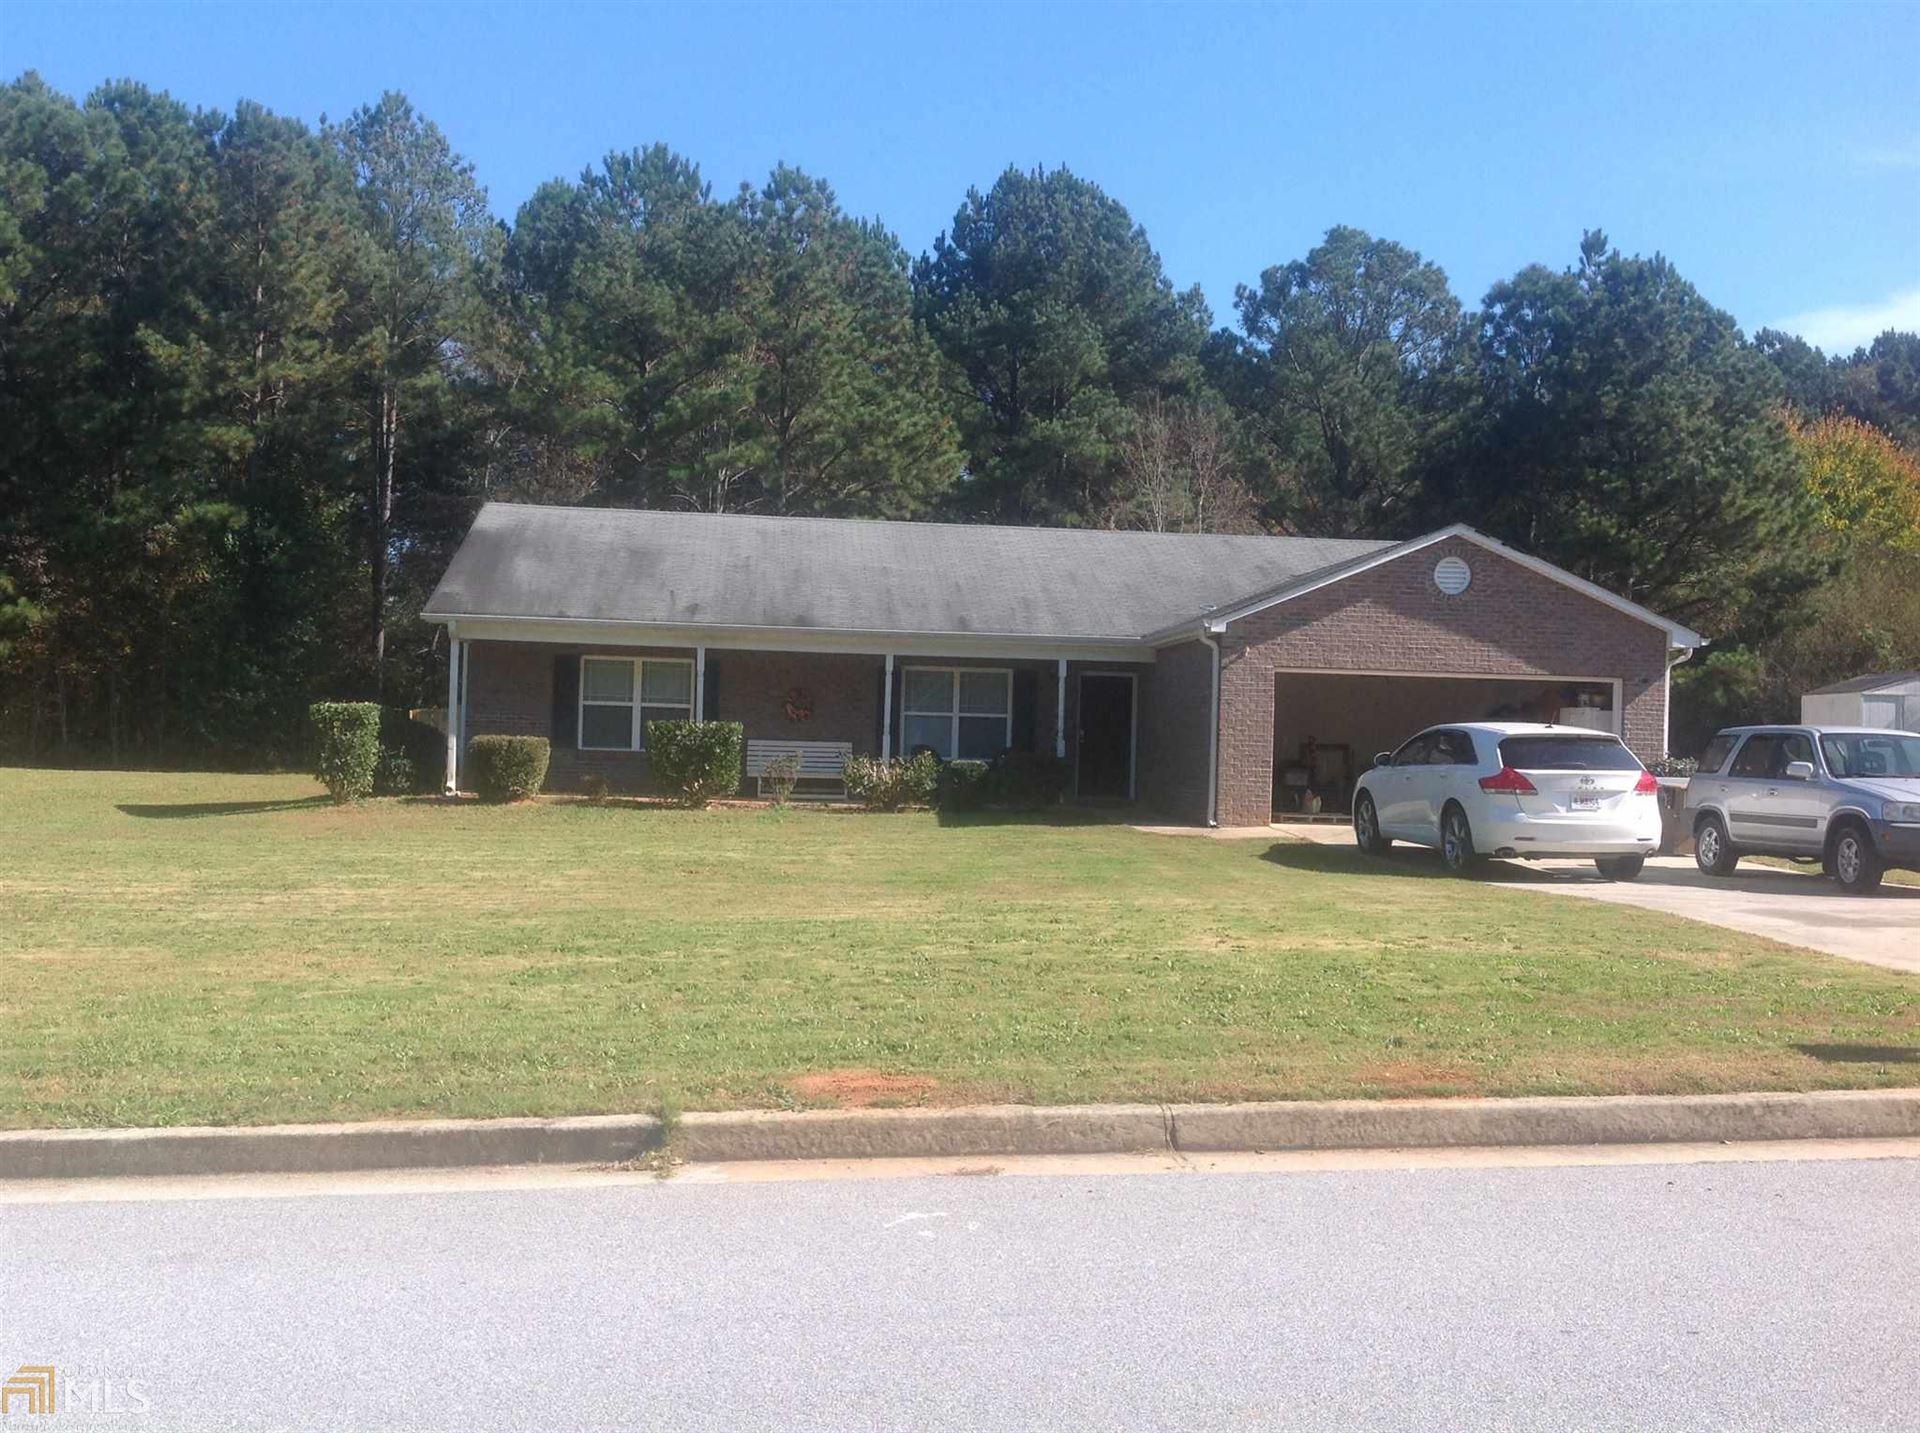 105 Joshua Creek Rd, Covington, GA 30016 - MLS#: 8911574